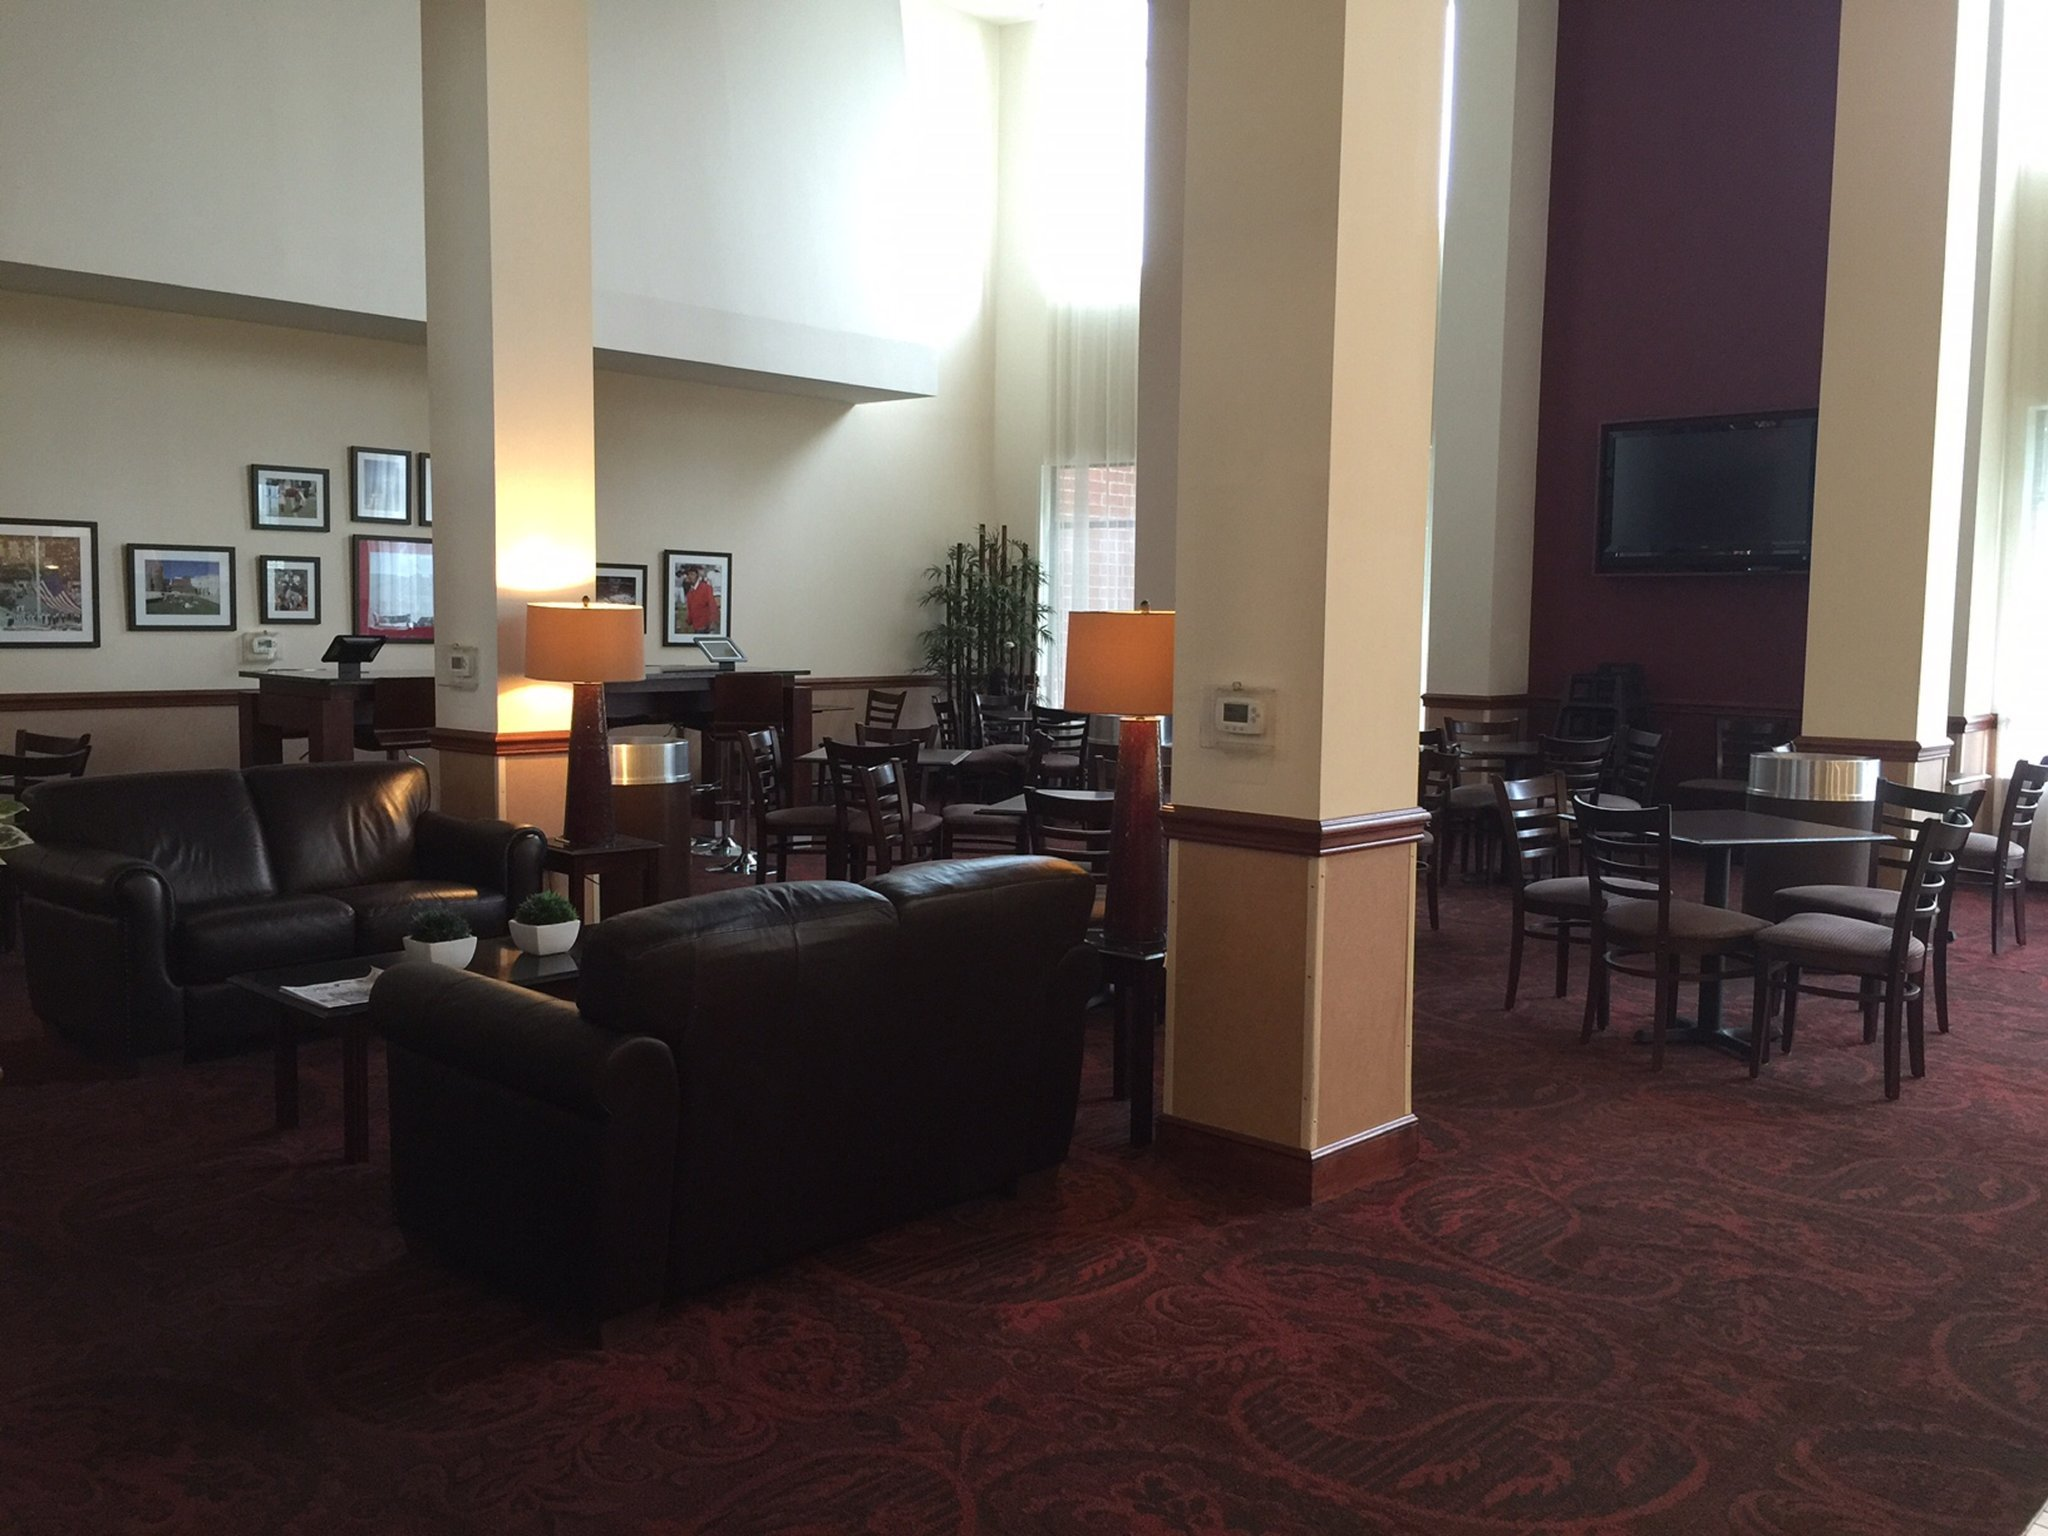 Ohio State Bedroom Decor Holiday Inn Express Hotel Suites Columbus University Area Osu